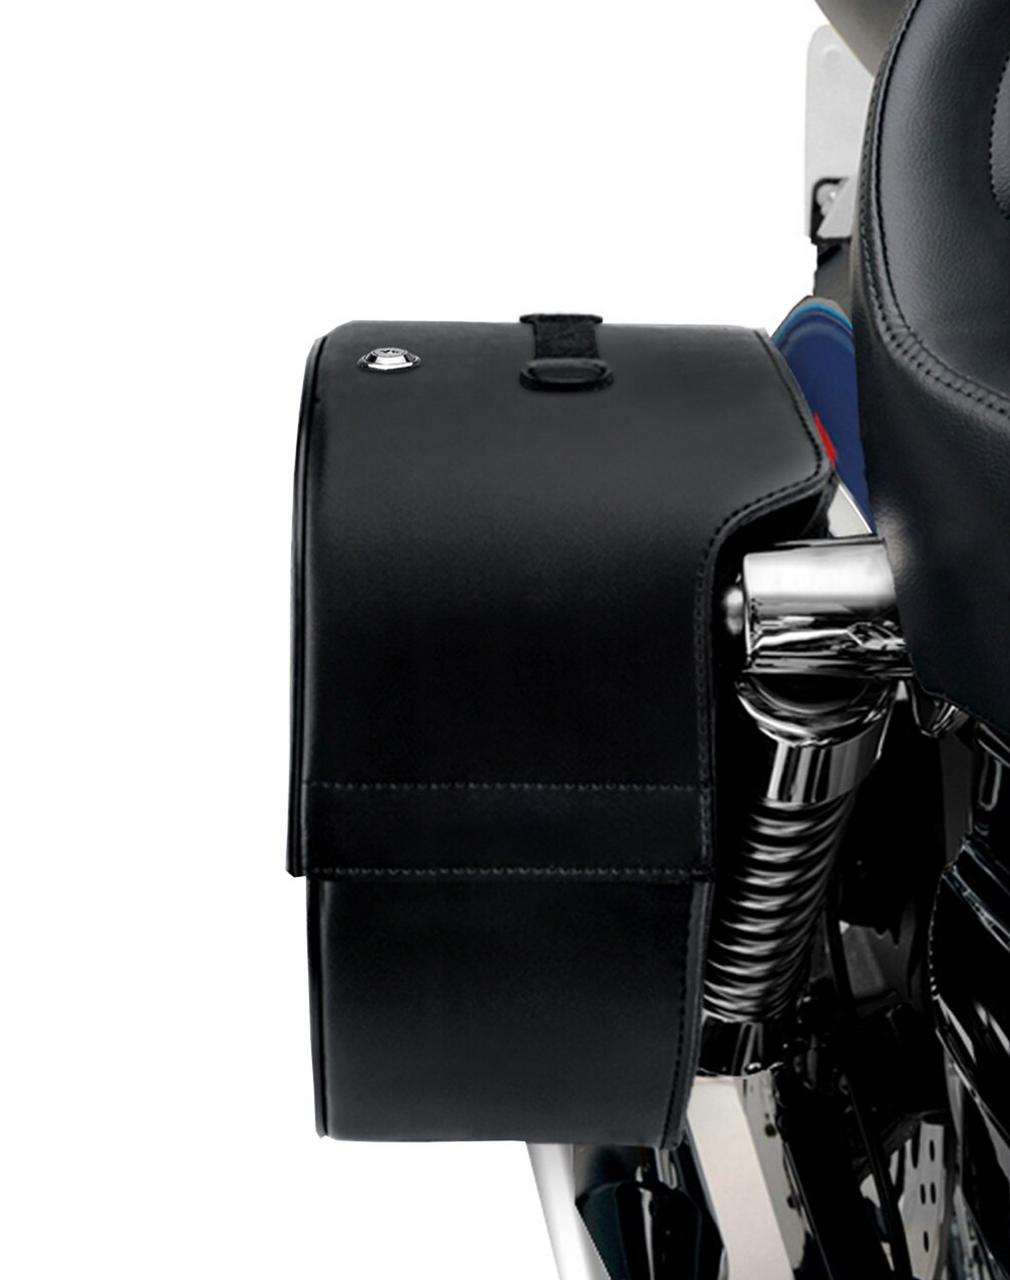 Honda Magna 750 Armor Shock Cutout Motorcycle Saddlebags shock cutout view